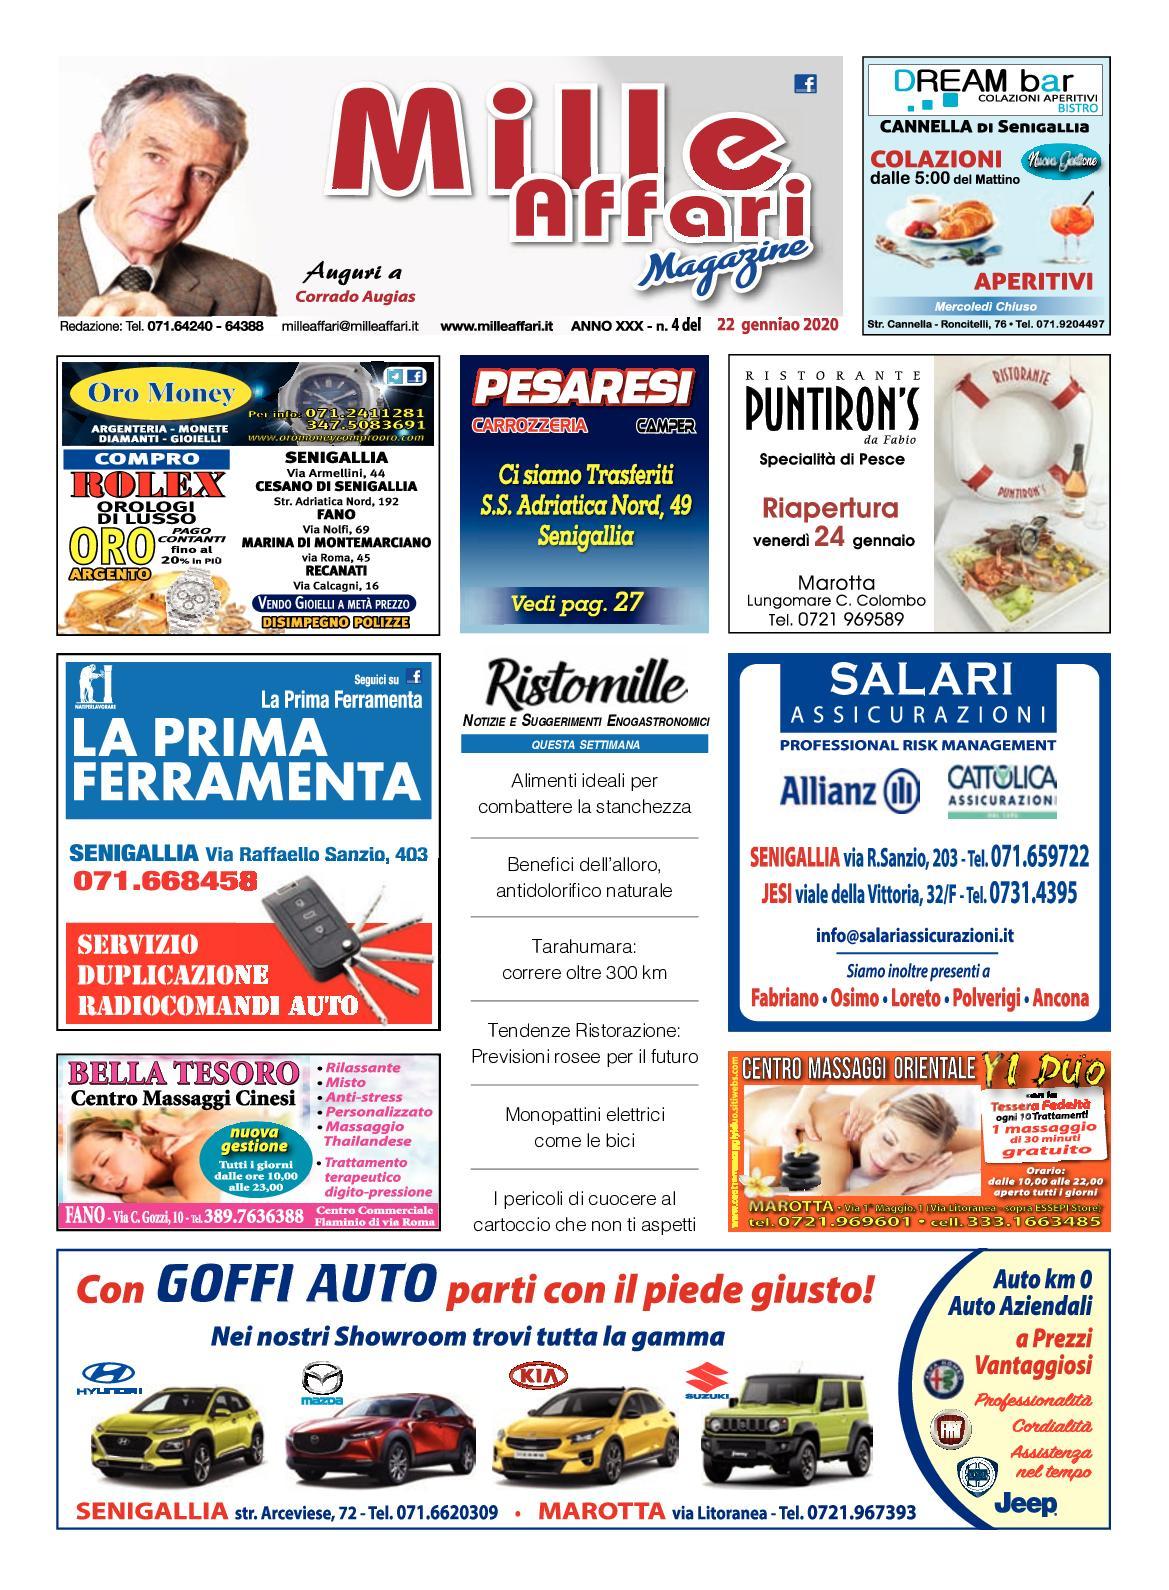 PANNELLO Superdry Board Argento Grigio Sabbia VGK